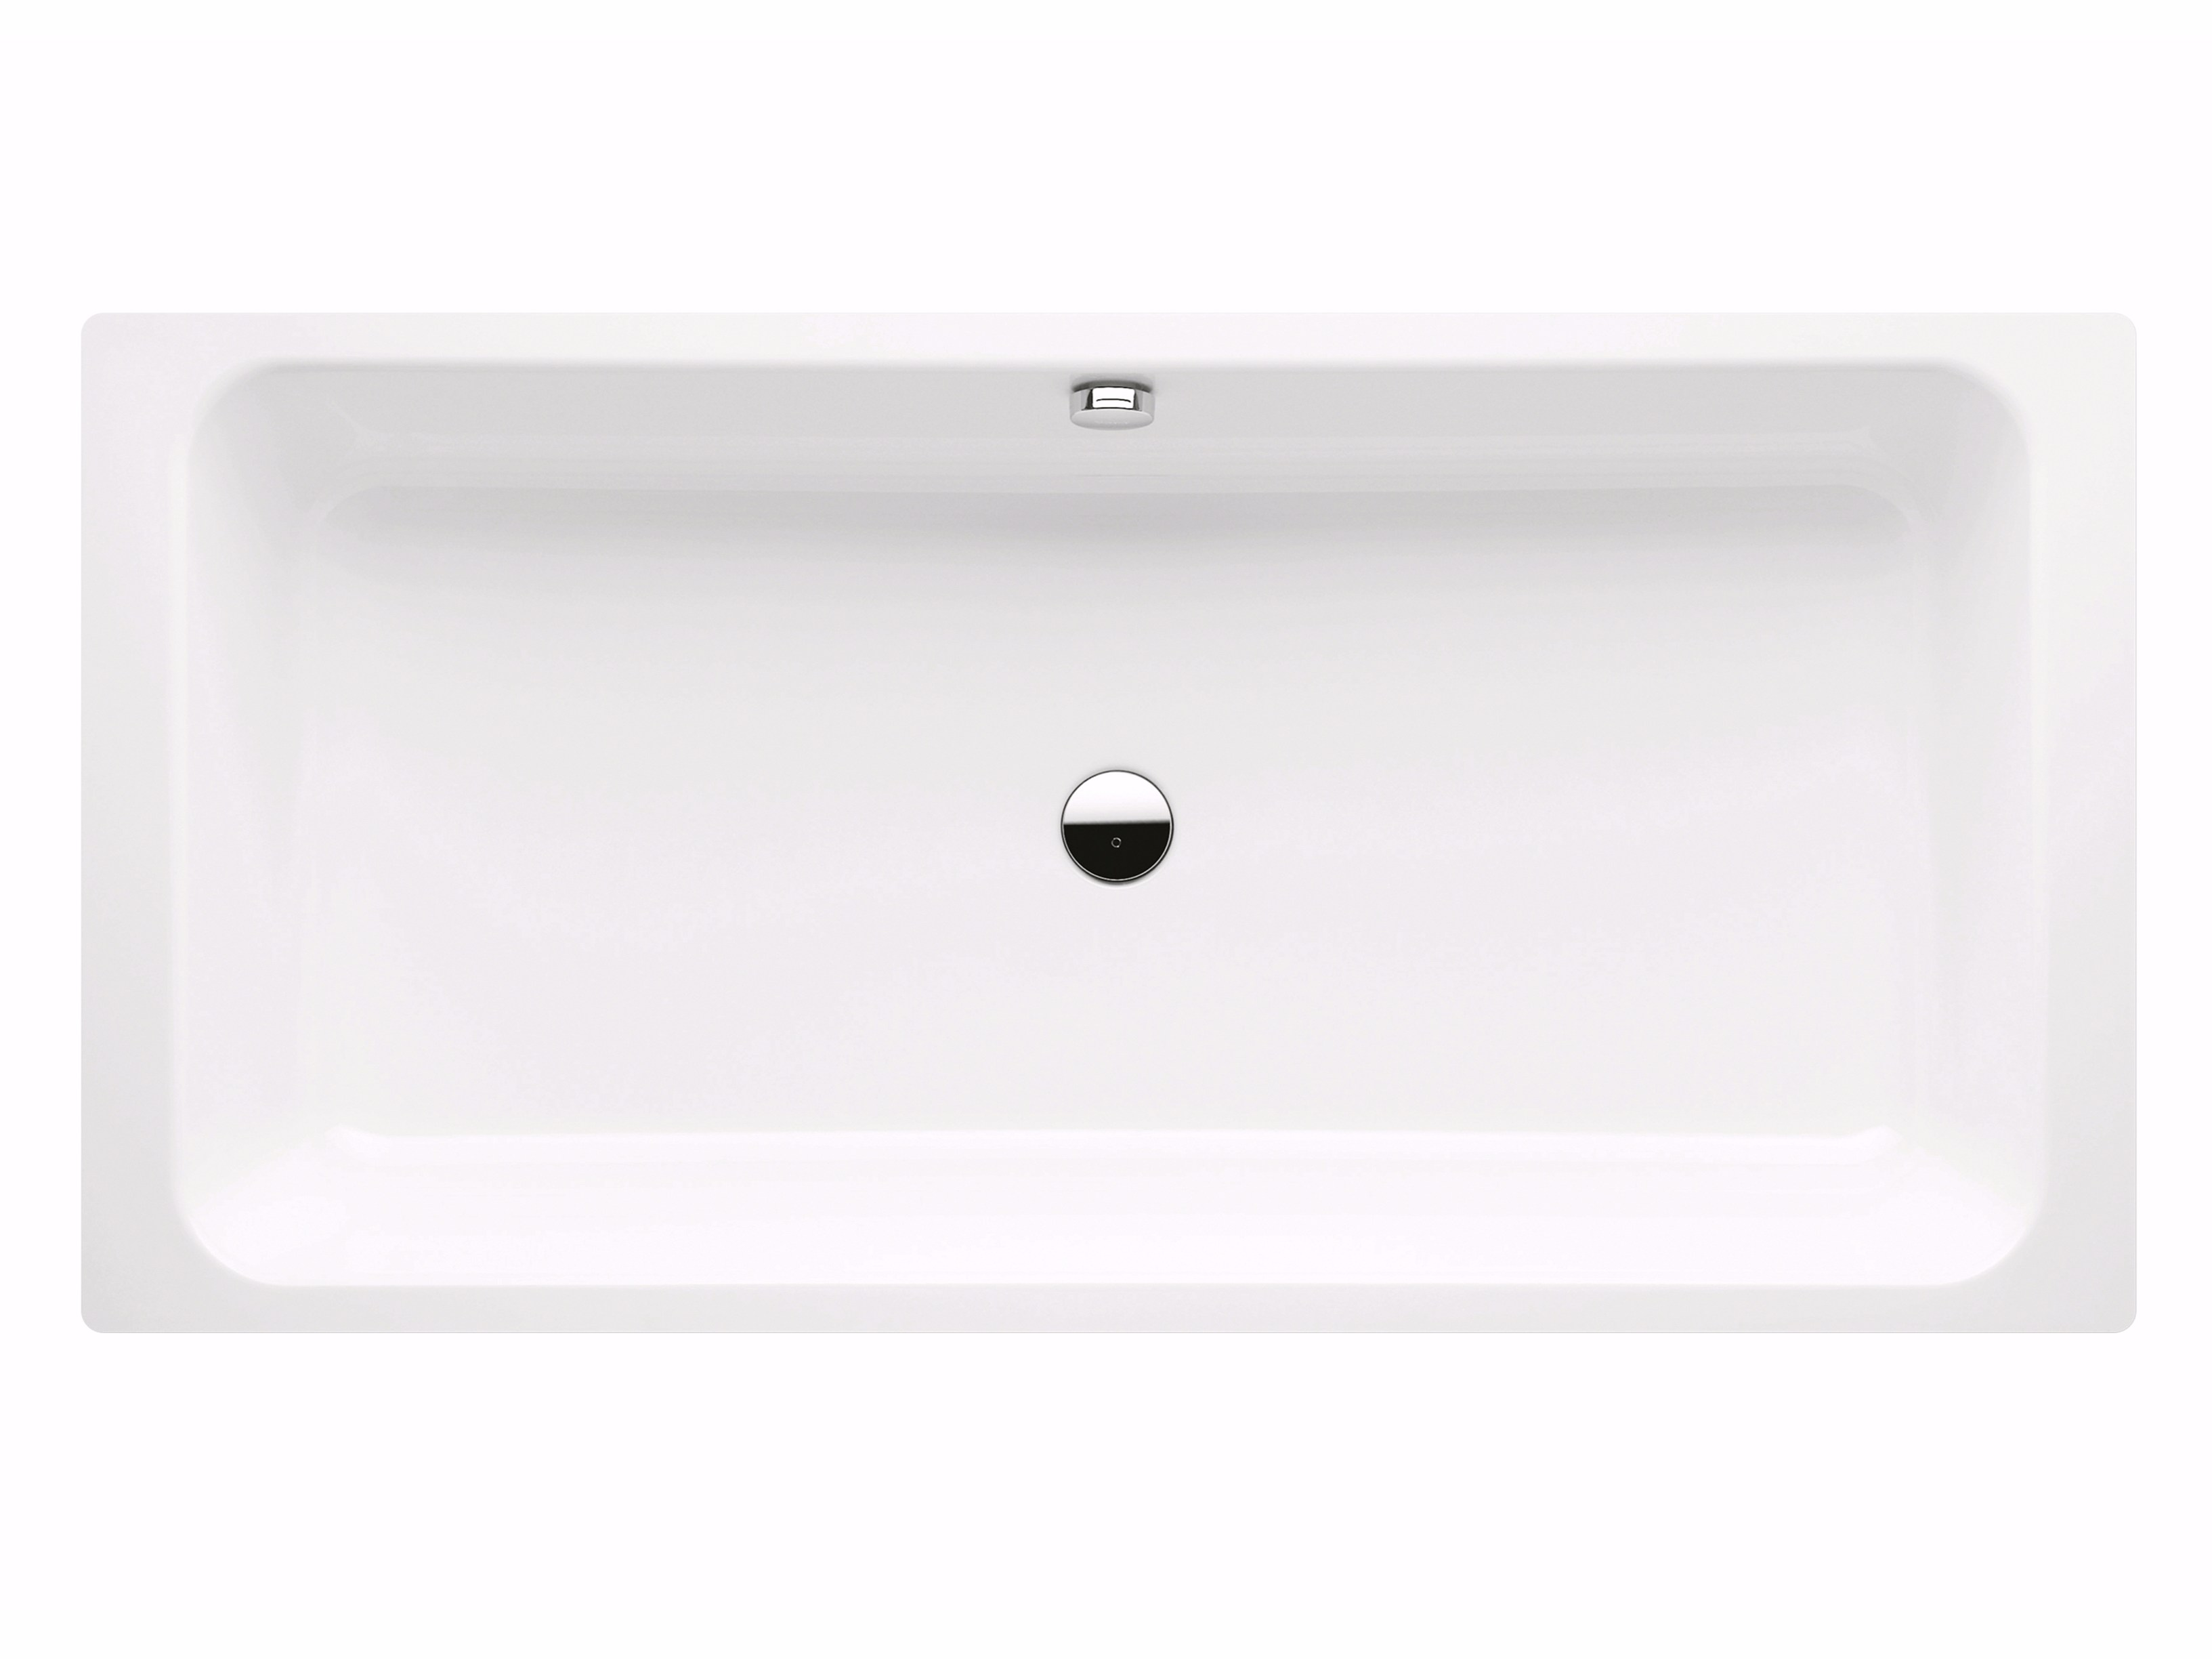 Vasca da bagno in acciaio smaltato bassino by kaldewei italia design phoenix design - Kaldewei vasche da bagno ...